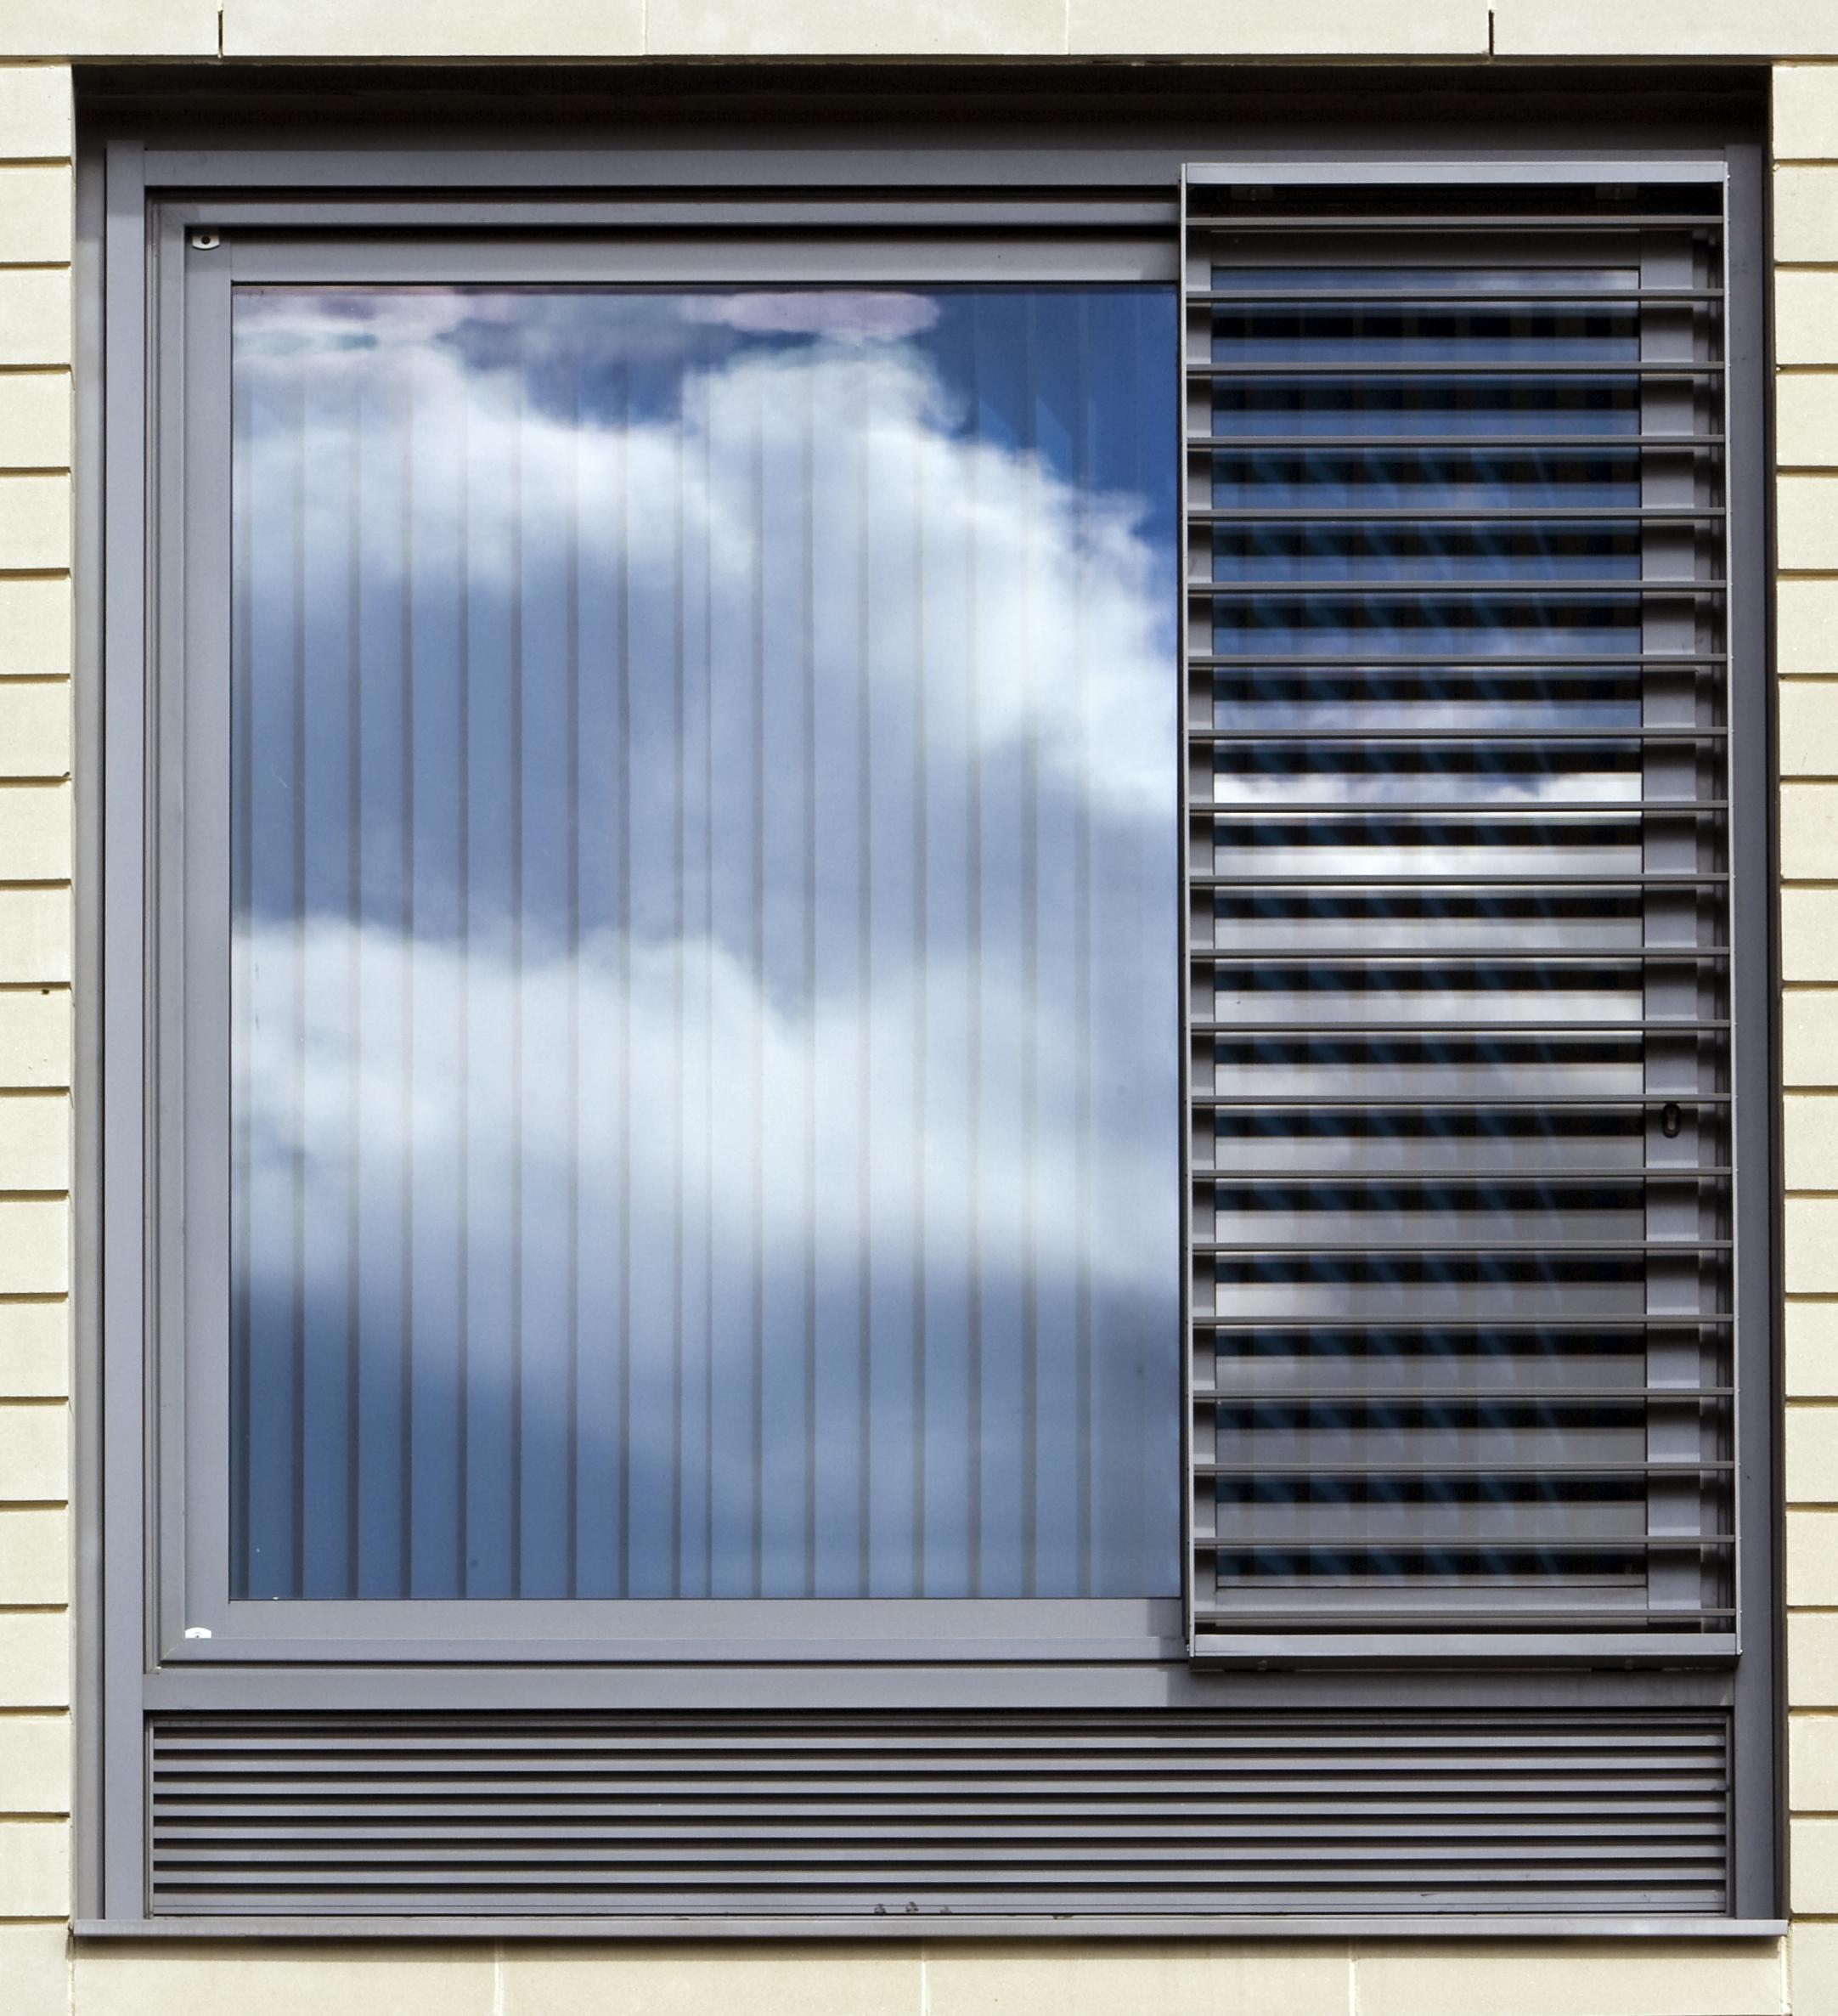 Jordanhill 29_Window_Detail.jpg